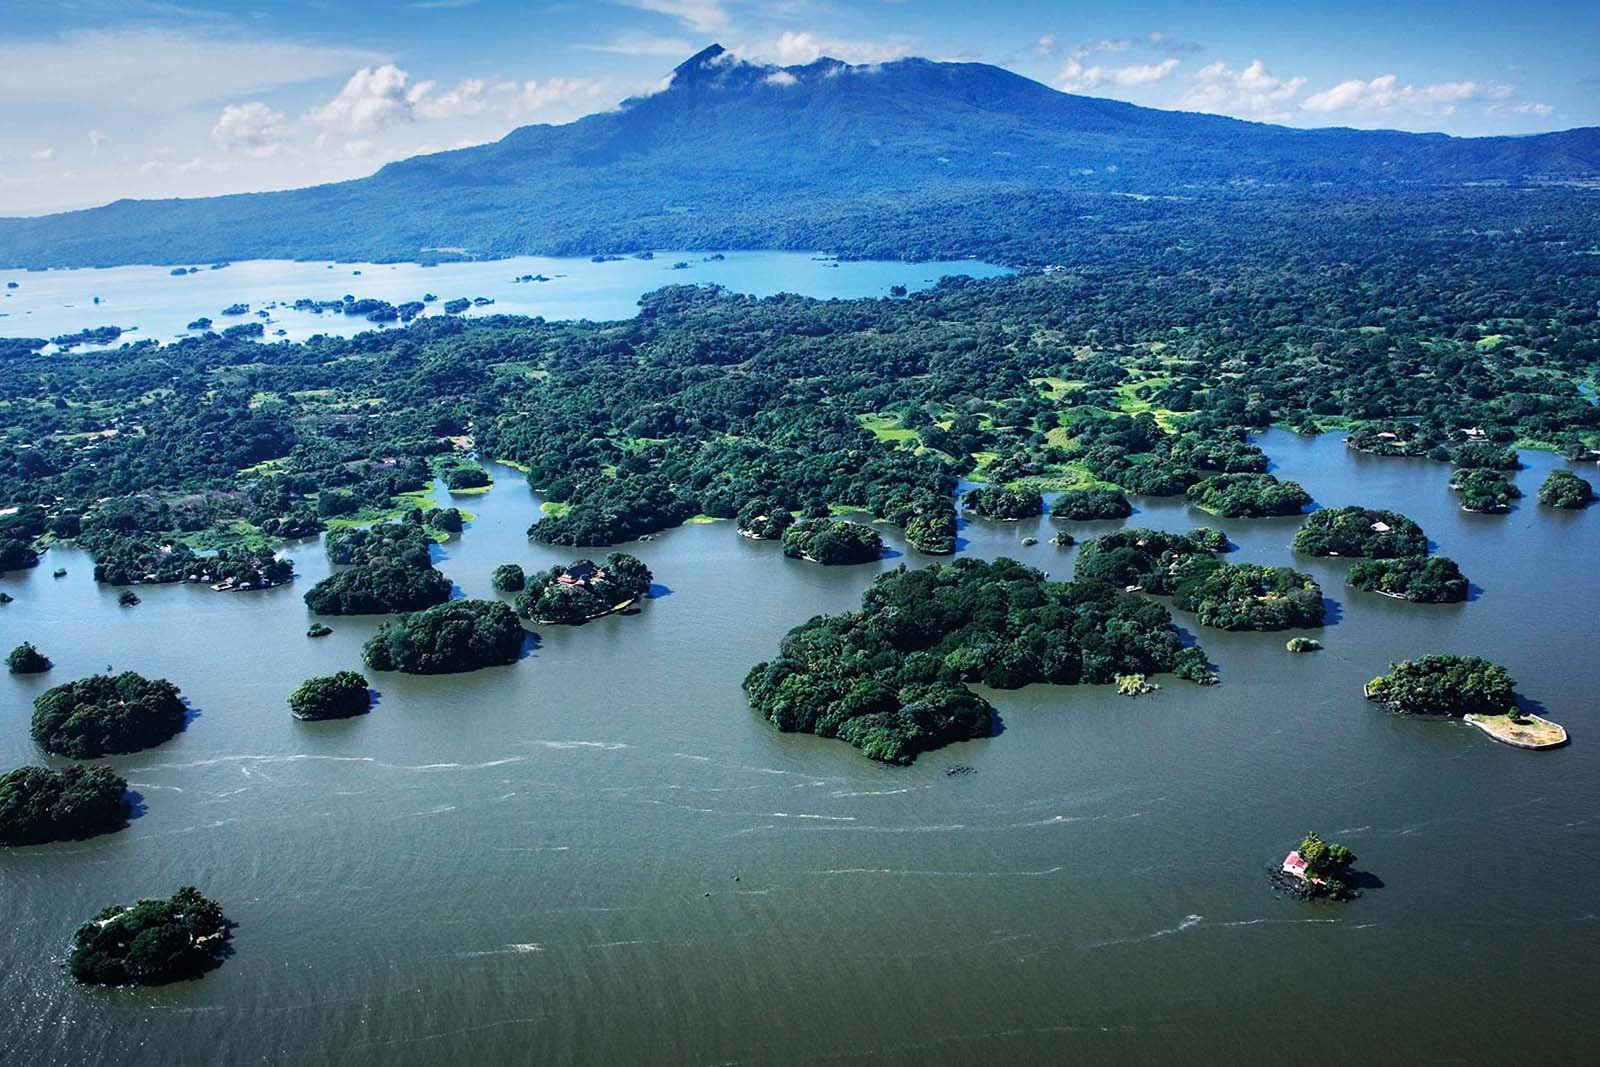 Mejores fotografos de nicaragua